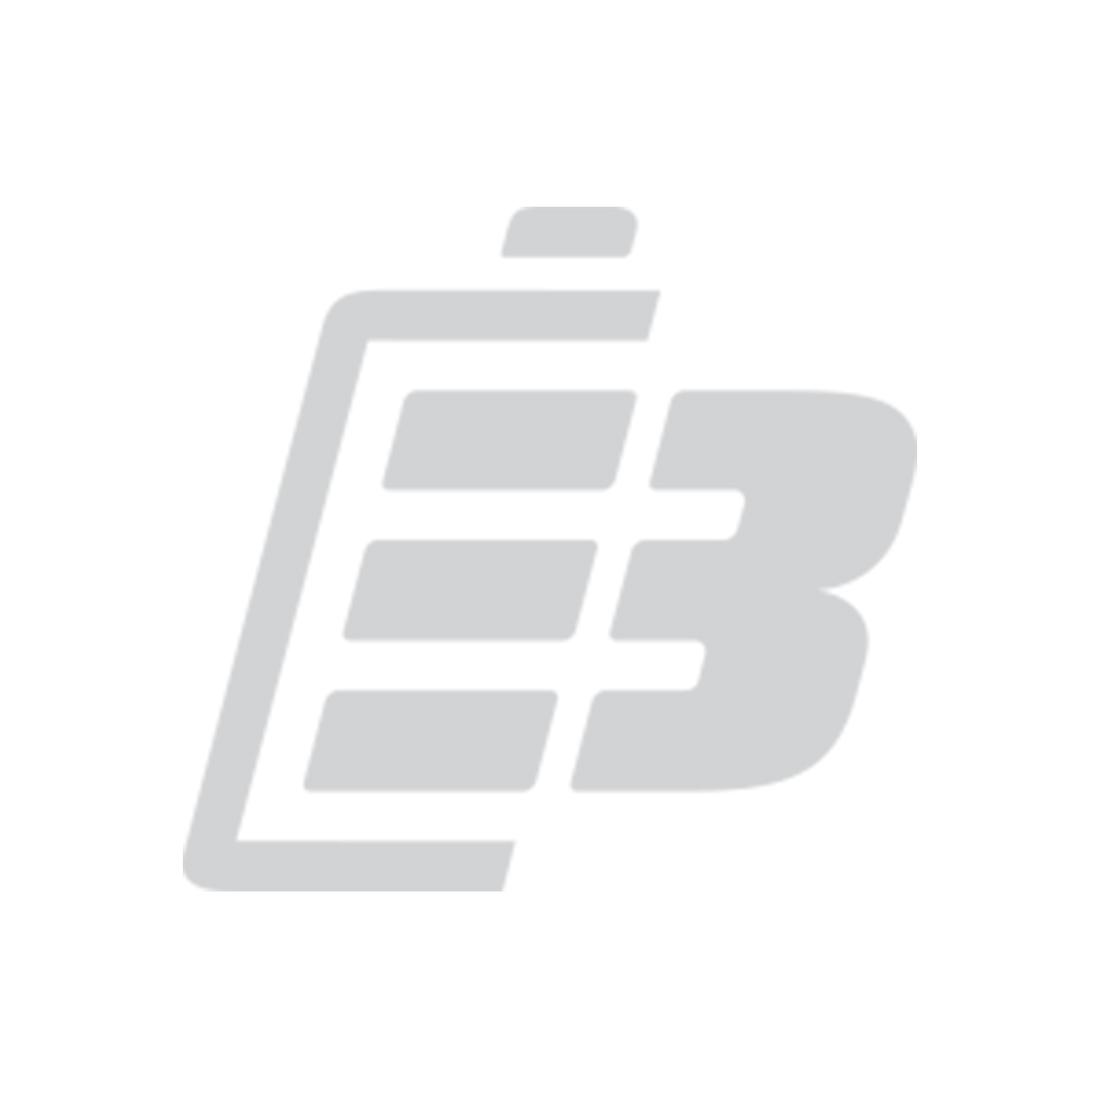 CSB Lead Acid Battery GP1245 1